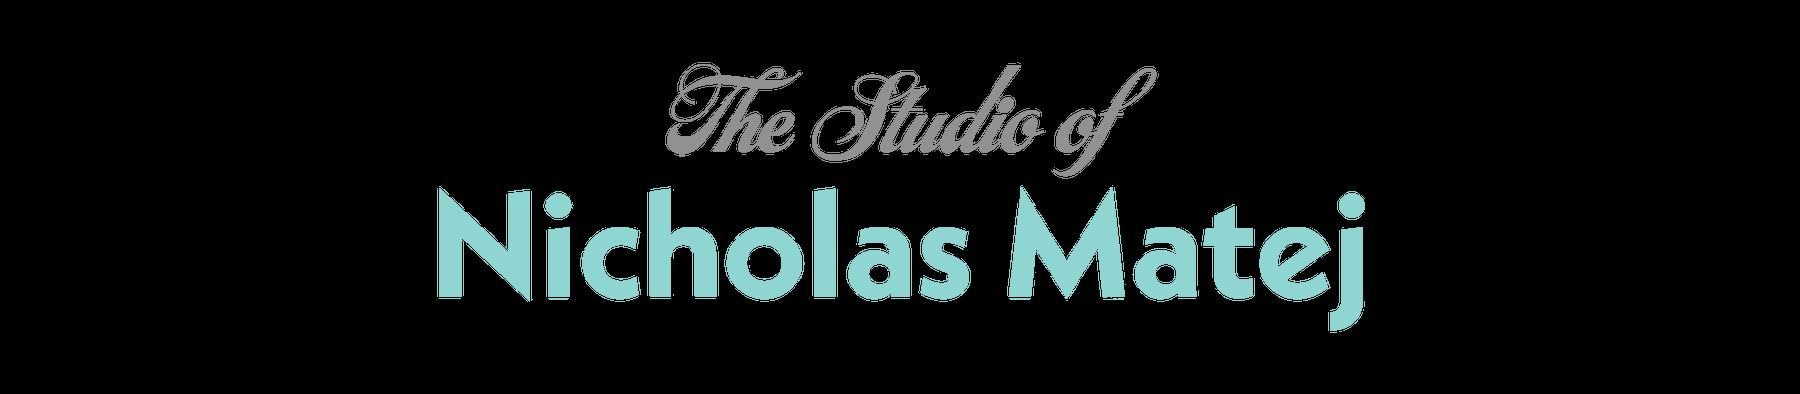 Studio of Nicholas Matej